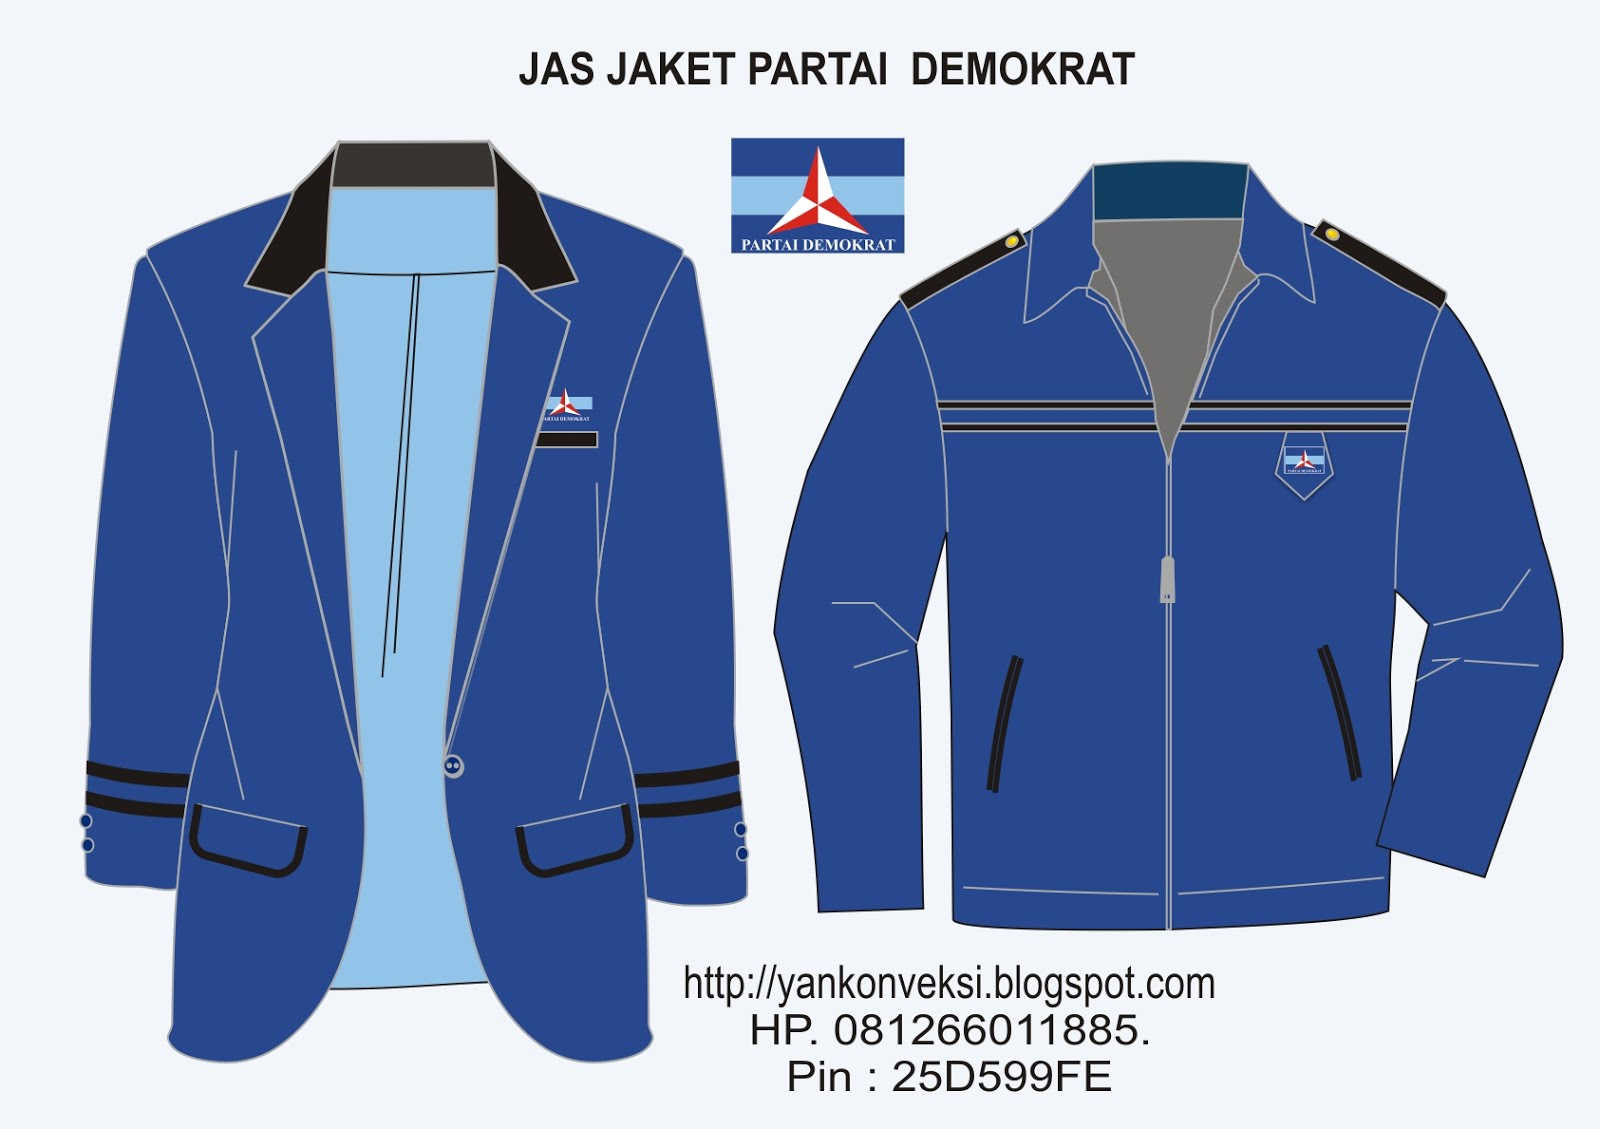 PESANAN JAS JAKET PENGURUS PARTAI DEMOKRAT